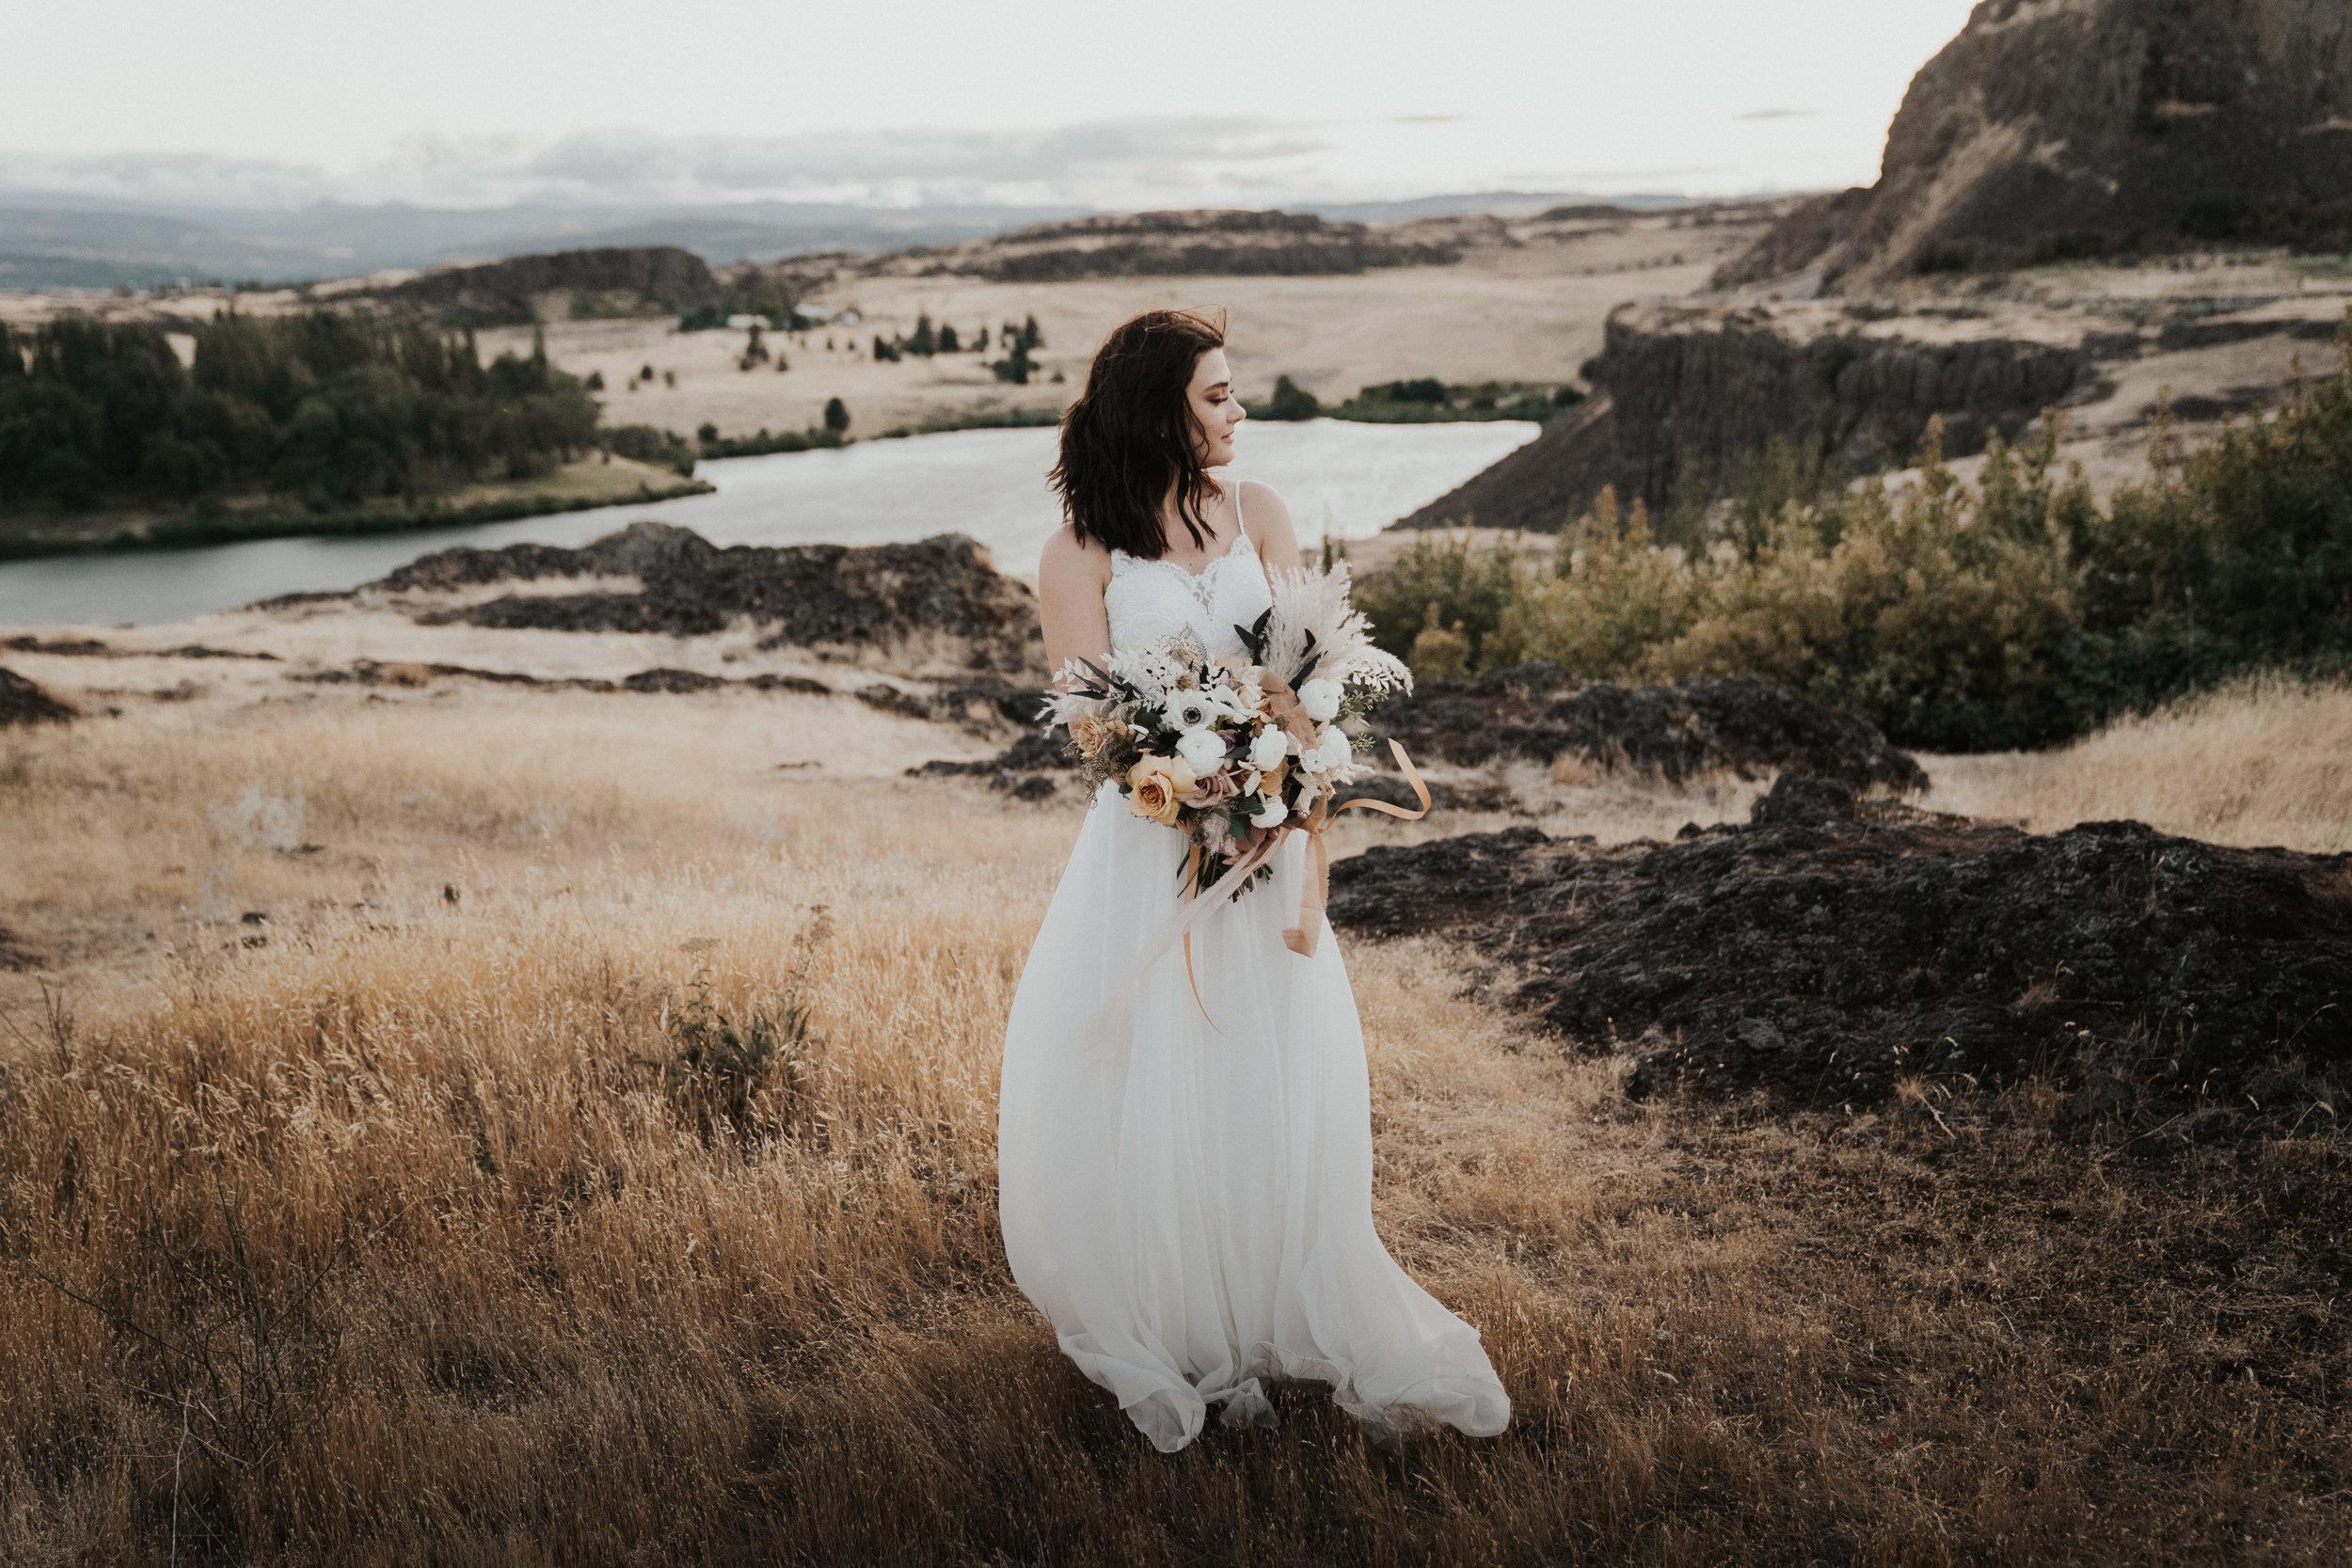 columbia-river-gorge-wedding-elopement-inspiration-36.jpg